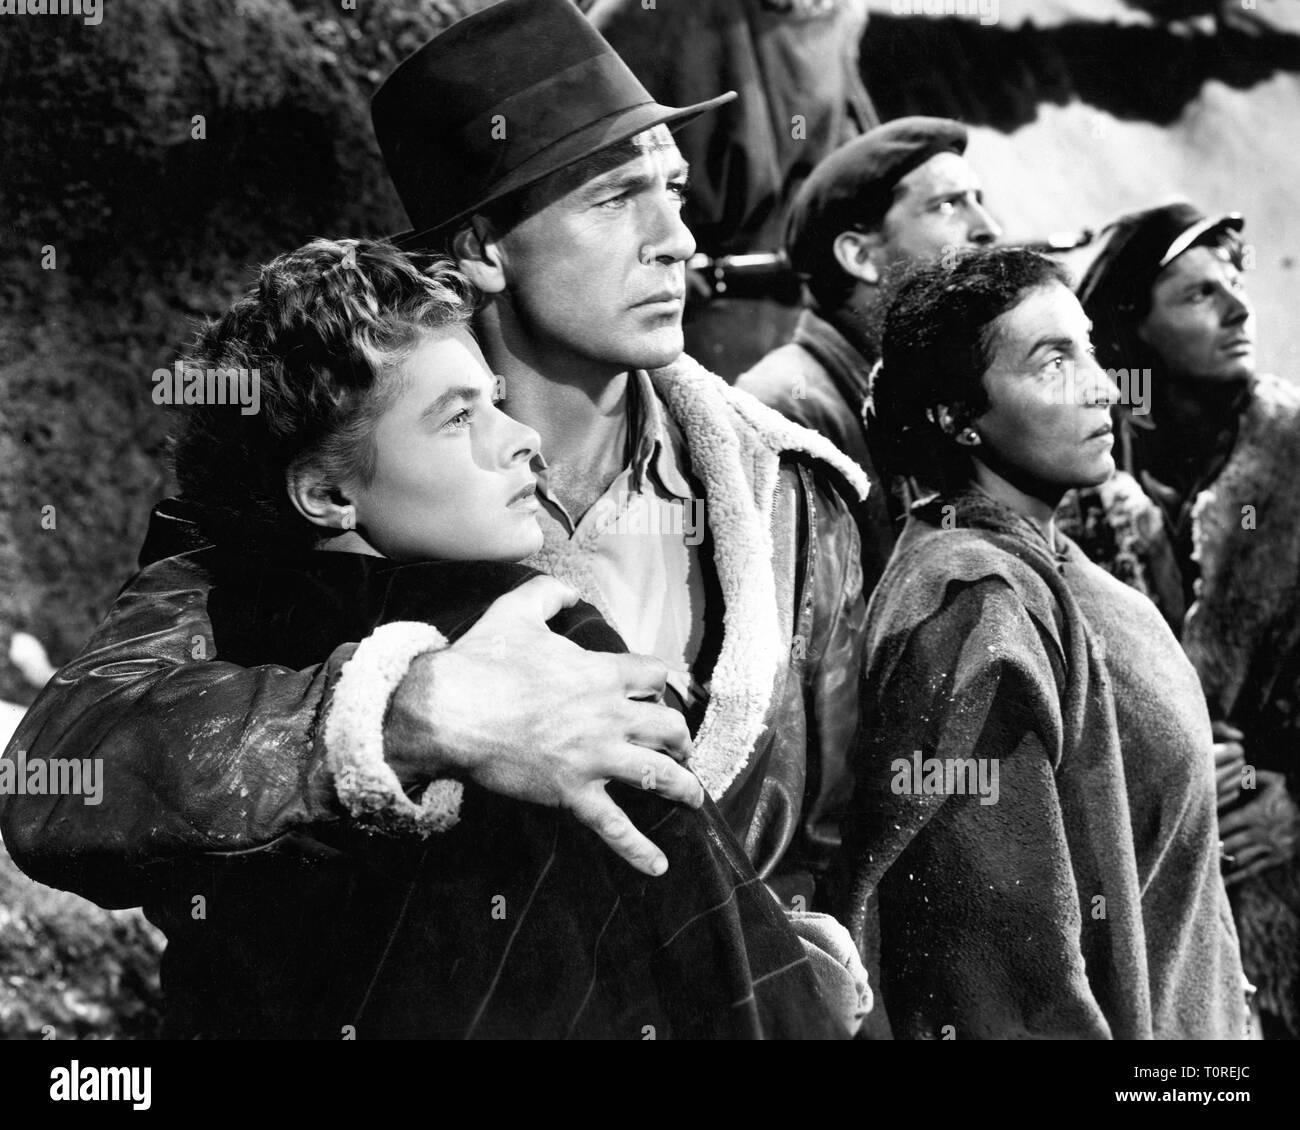 Ingrid Bergman as Maria Gary Cooper as Robert Jordan Katina Paxinou as Pilar FOR WHOM THE BELL TOLLS 1943 director Sam Wood novel Ernest Hemingway screenplay Dudley Nichols Paramount Pictures - Stock Image